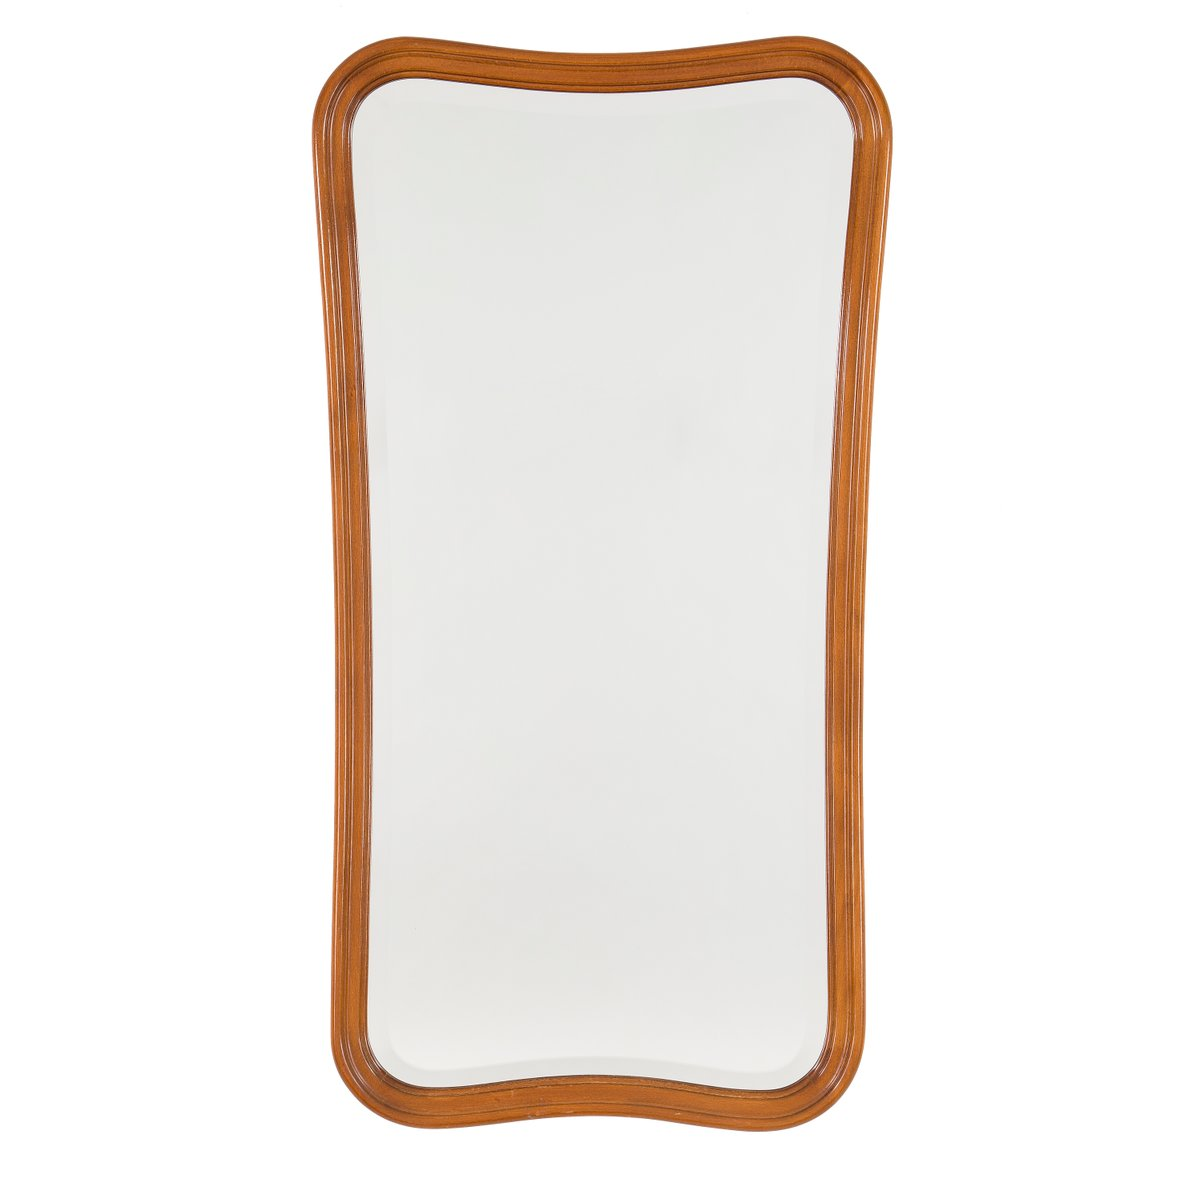 Scandinavian Modern Full Length Mirror From Glas Tr